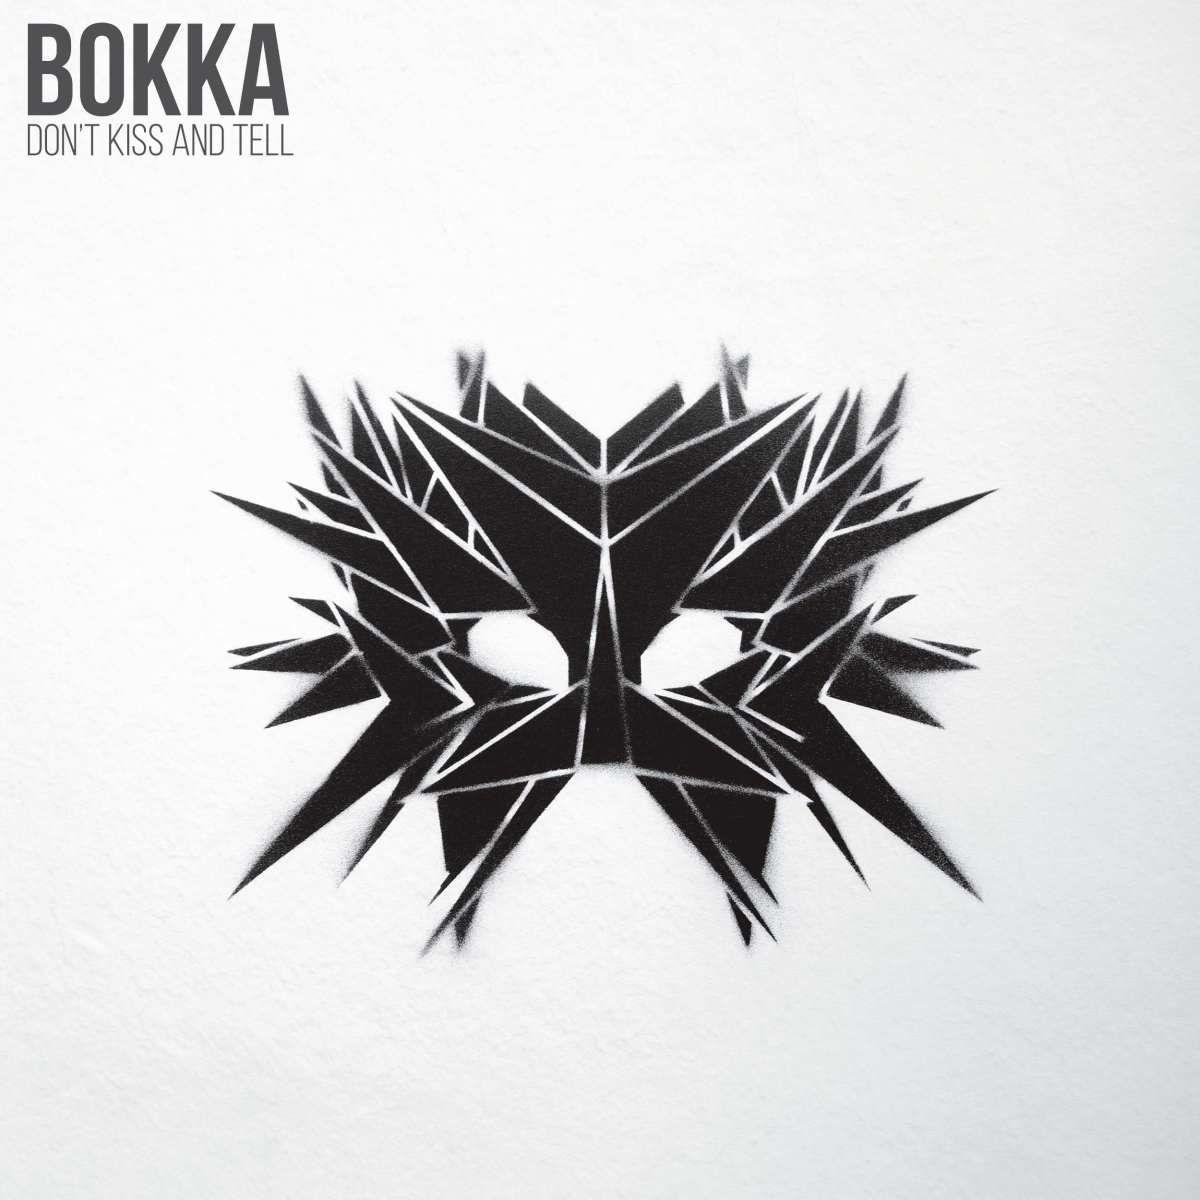 Bokka - Don't Kiss and Tell